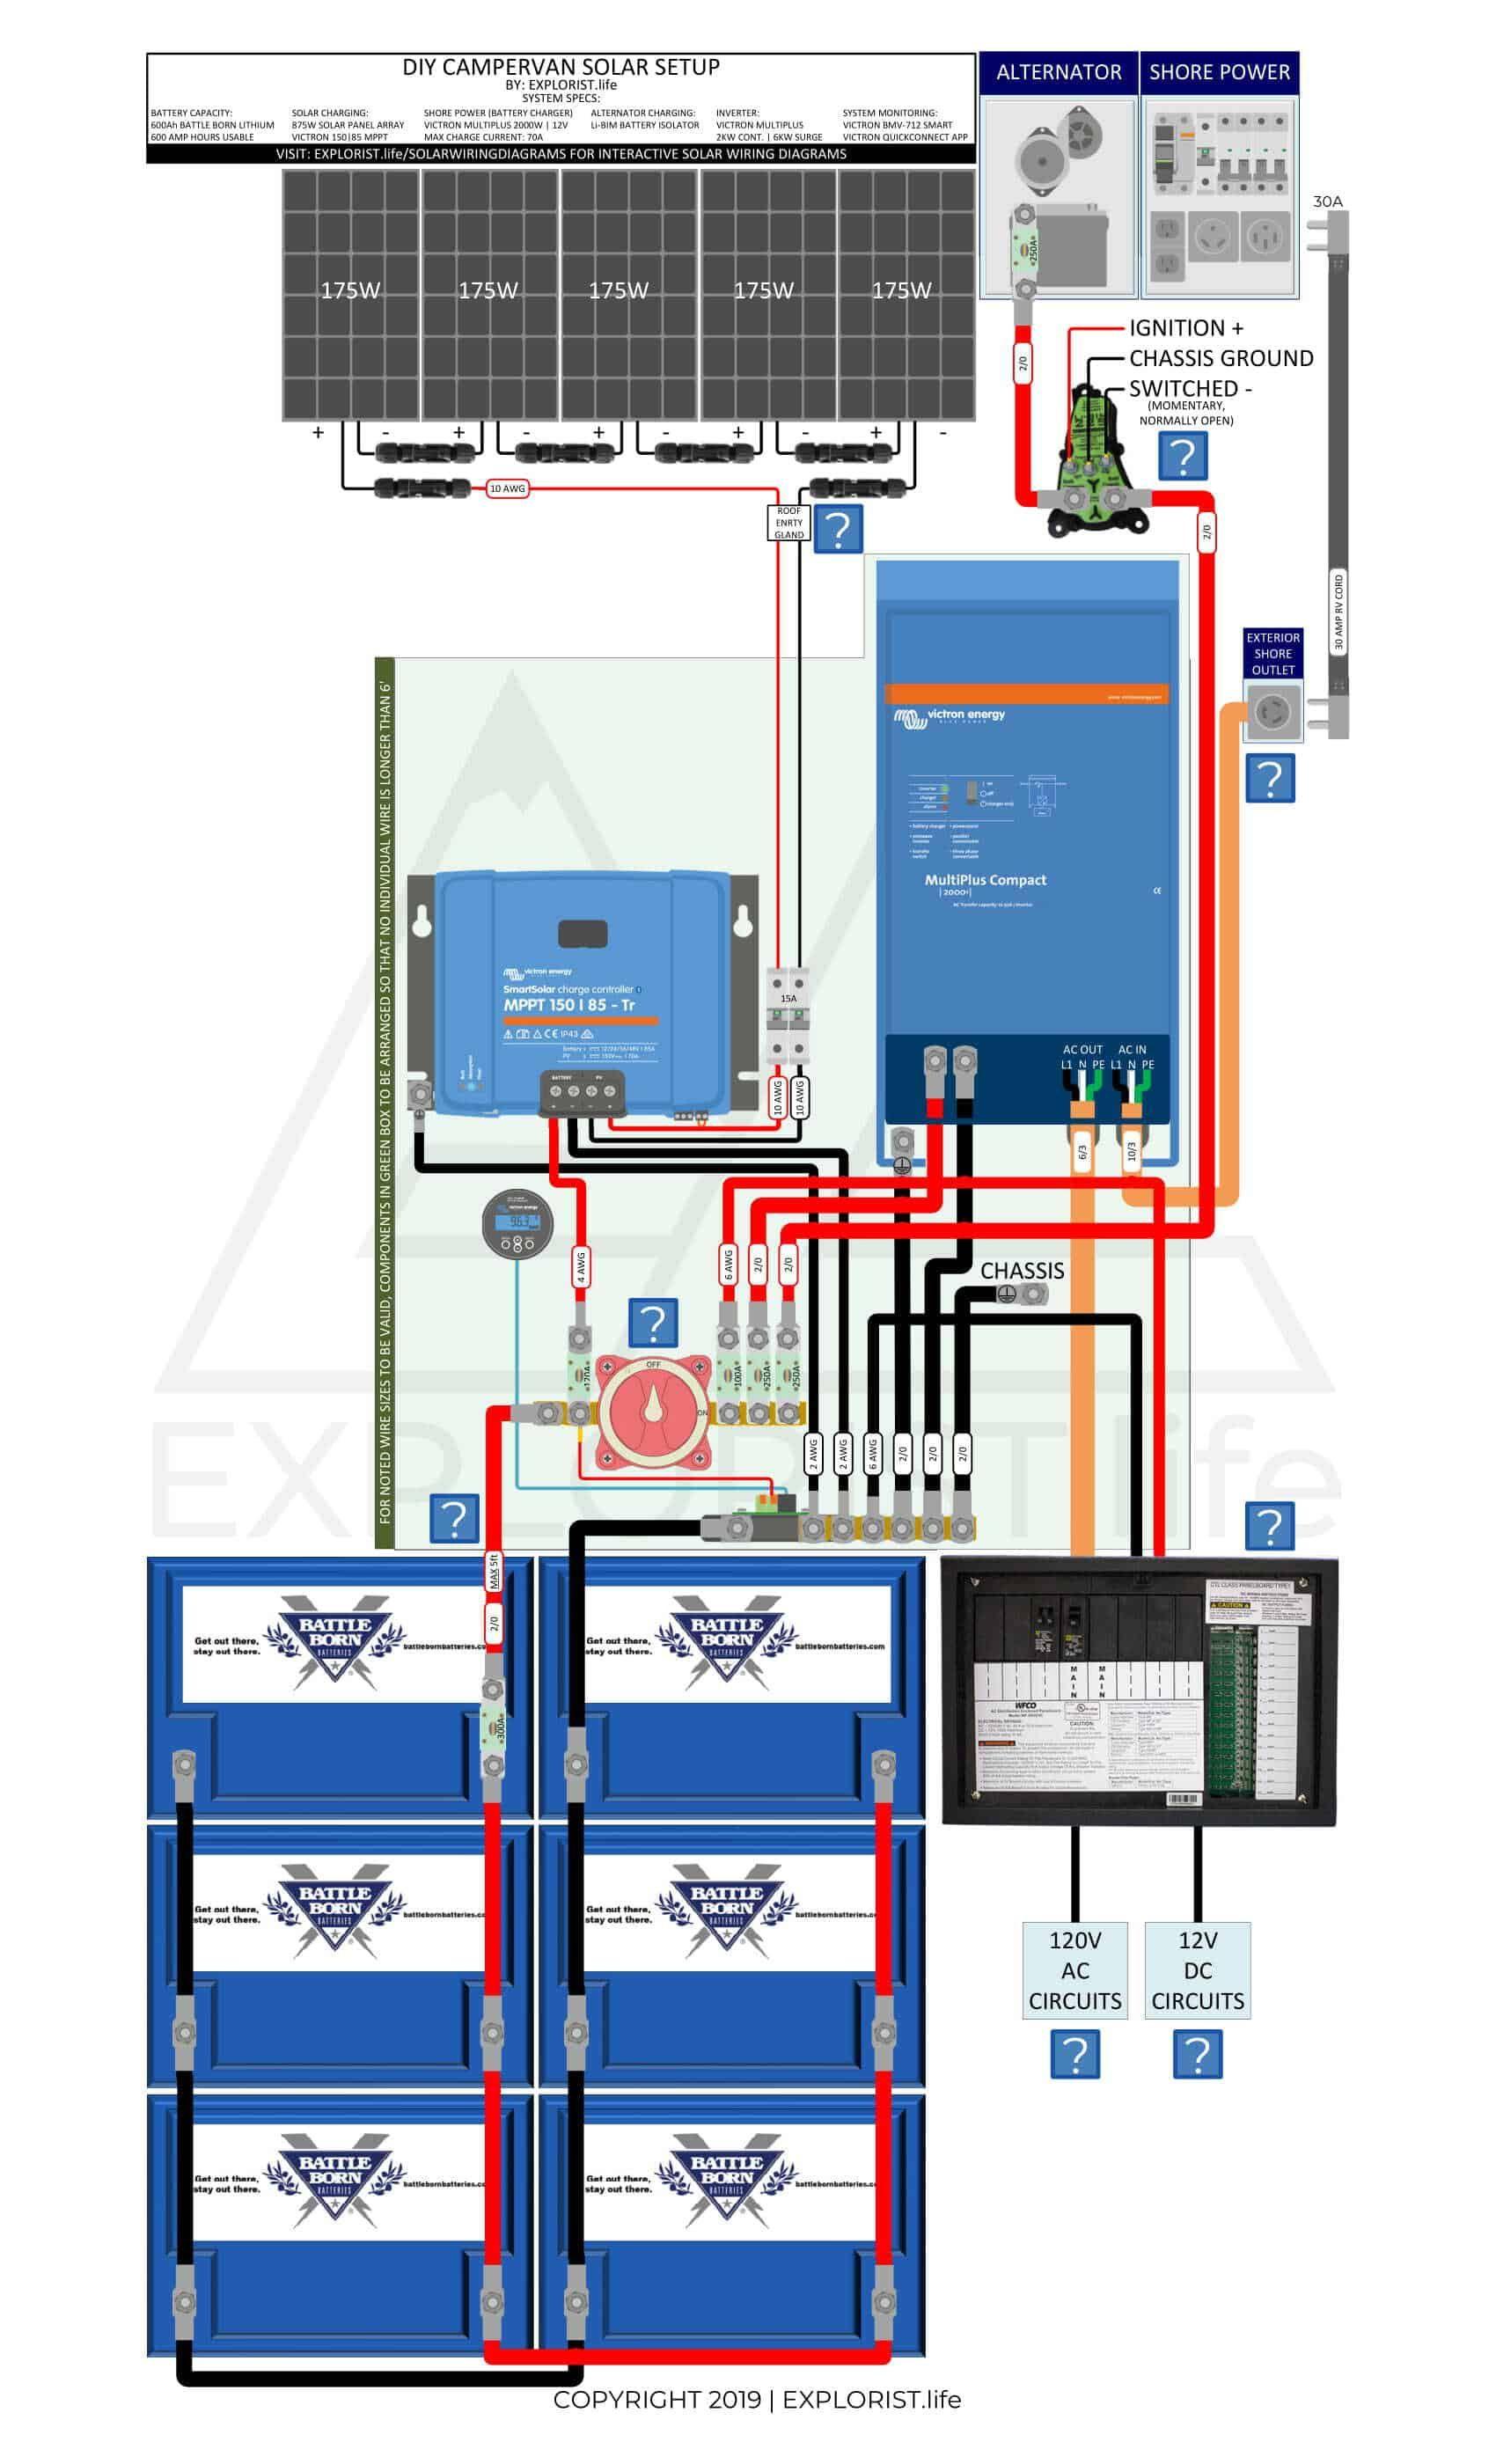 Diy Solar Wiring Diagrams For Campers Van S Rv S Diy Solar Solar Power Rv Solar